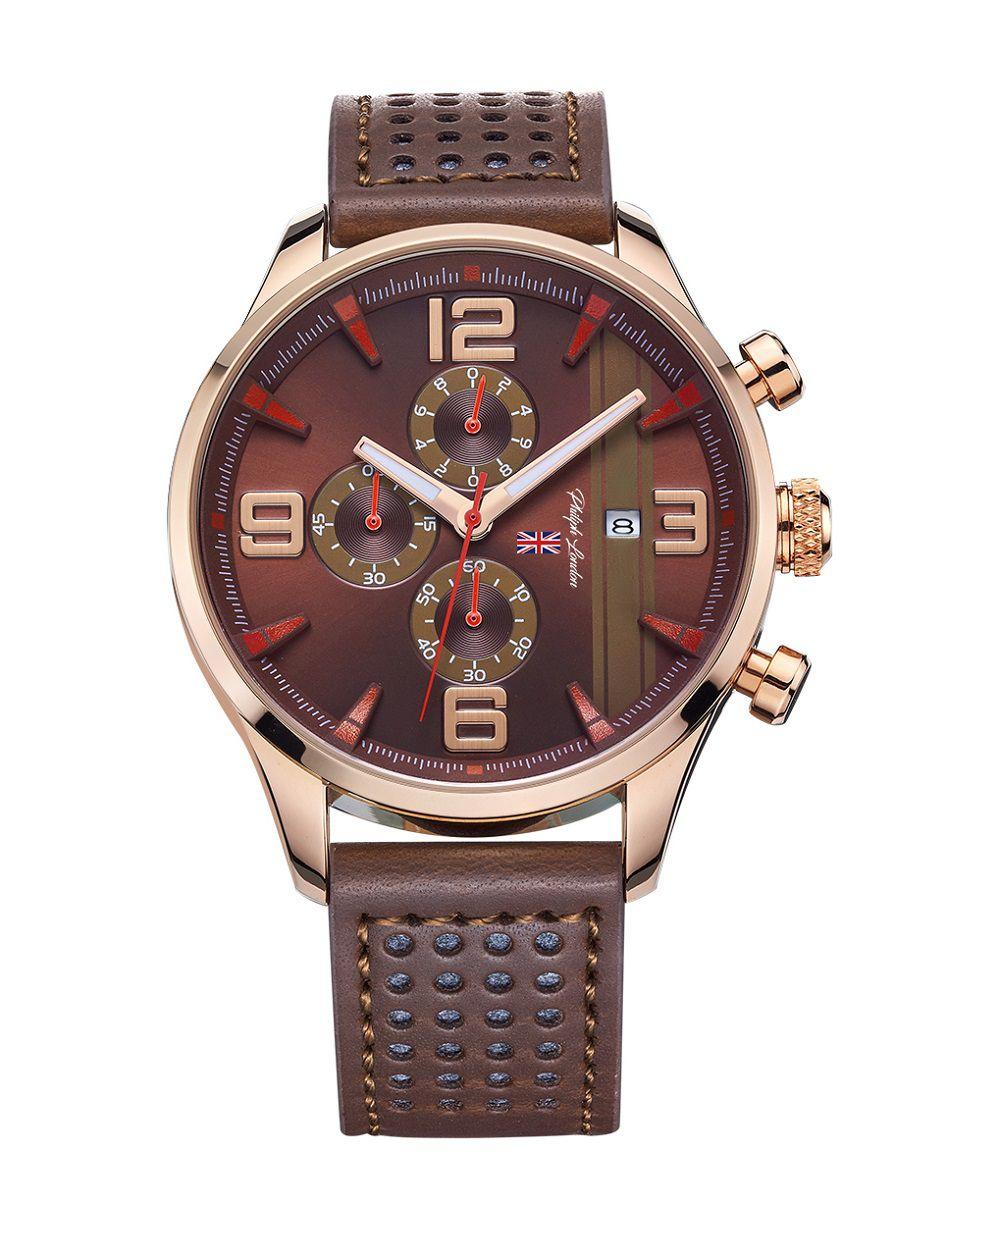 55ae882062c Relógio Philiph London Masculino PL80053612M